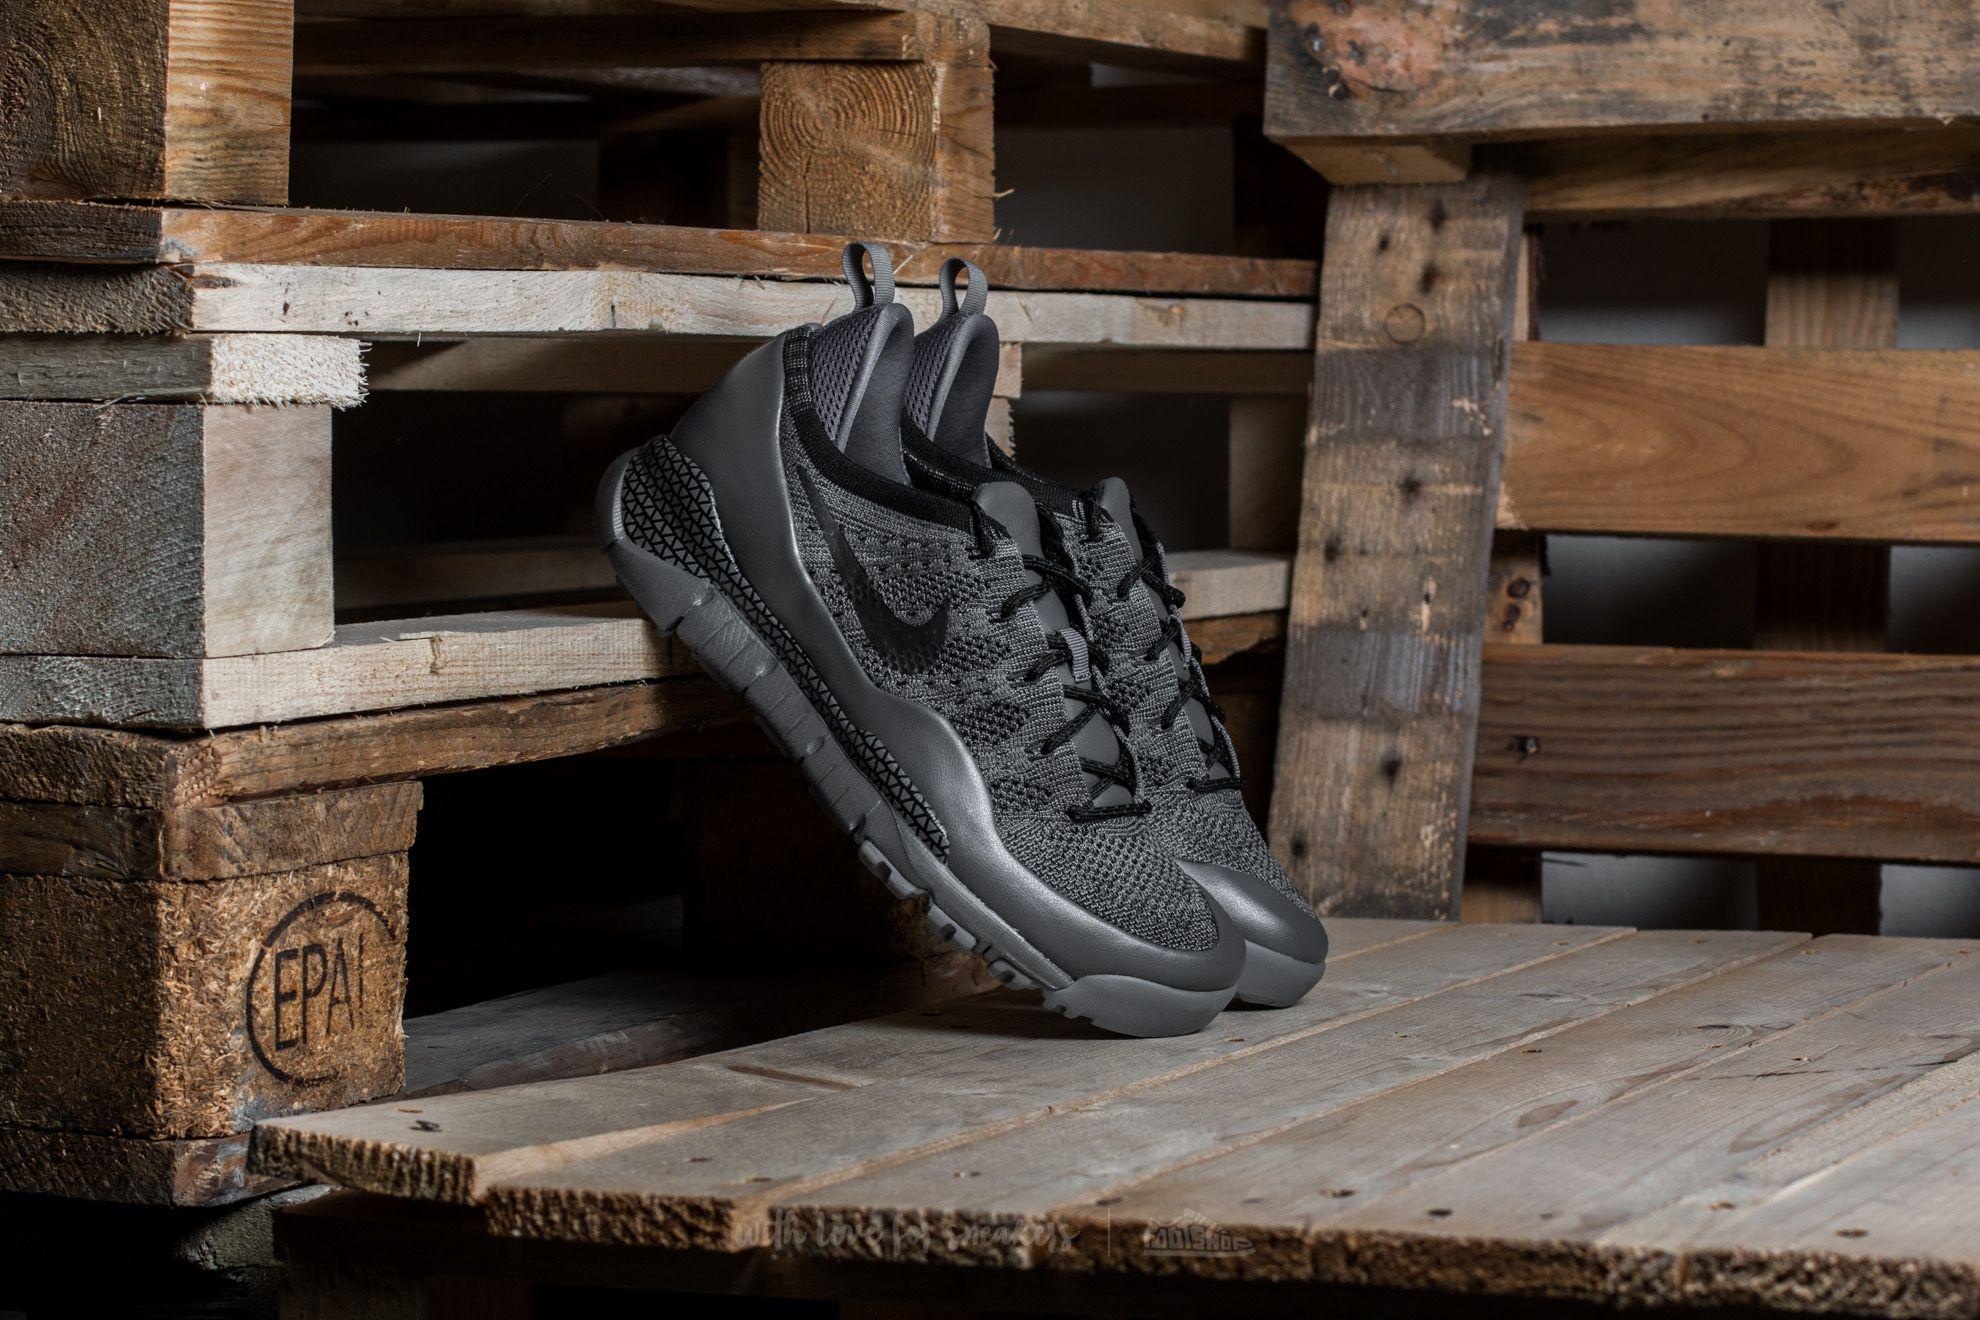 hot sale online 2f474 3c20b Nike Lupinek Flyknit Low Dark Grey  Black-Cool Grey at a great price 110